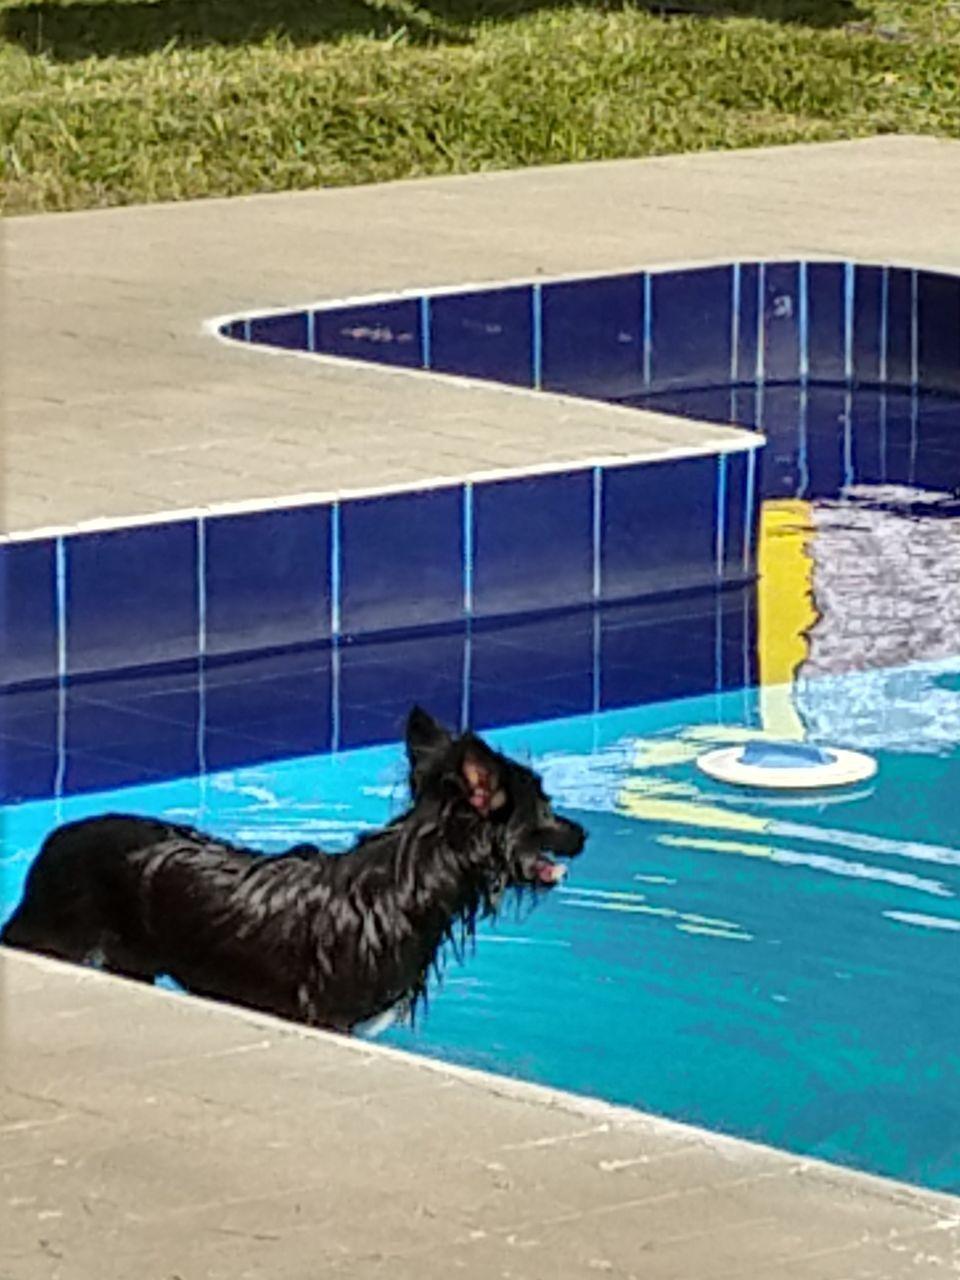 BLACK DOG IN SWIMMING POOL AT RESORT